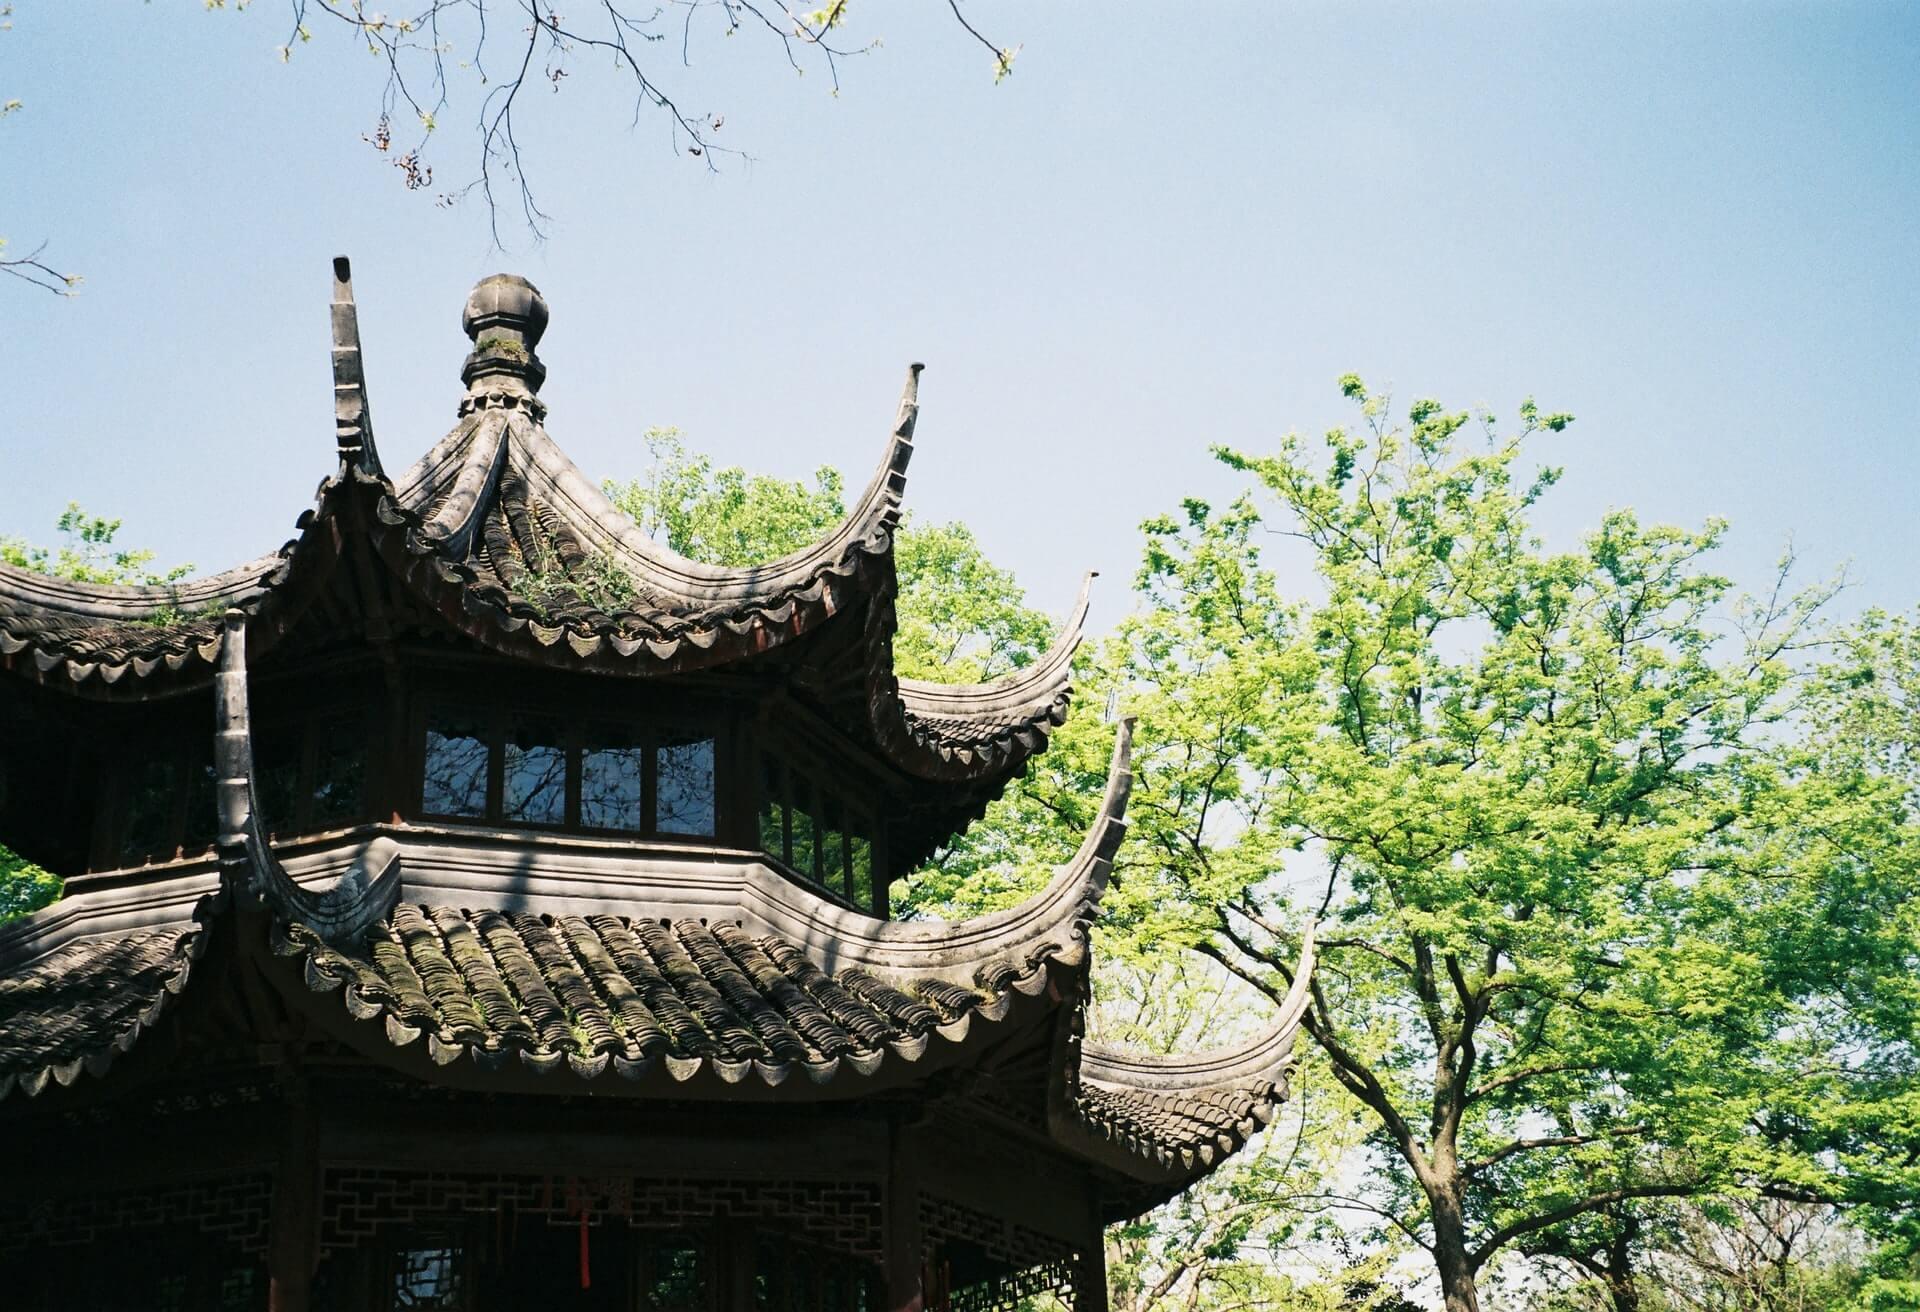 Suzhou ancient gardens